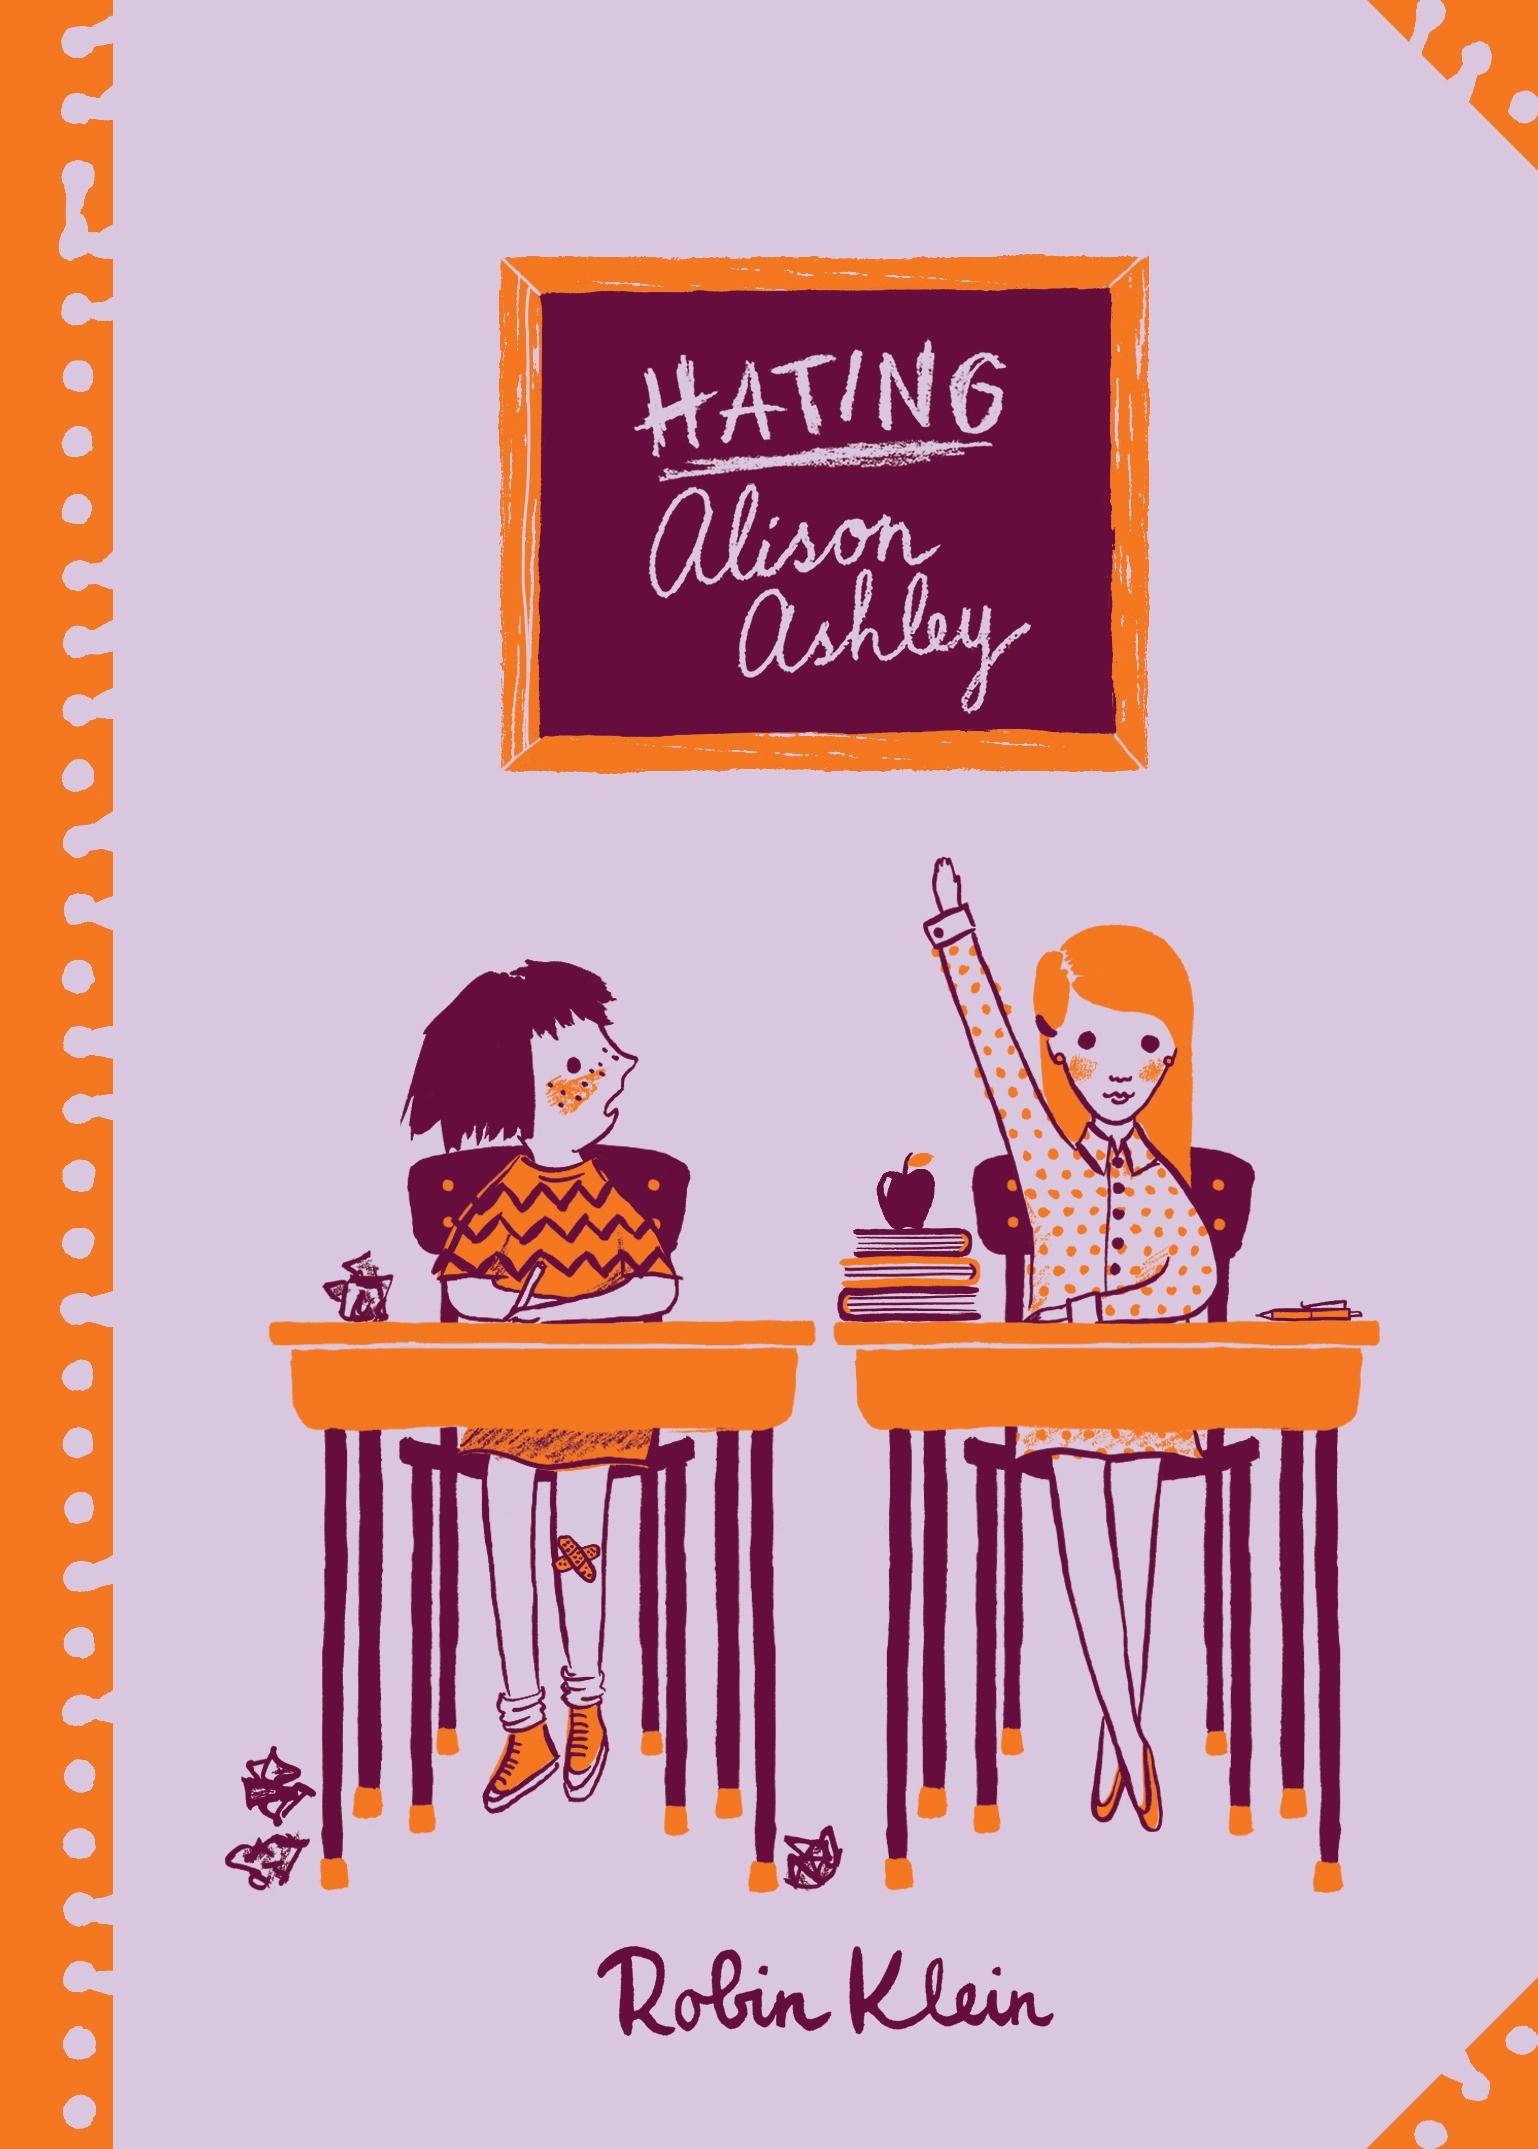 Book Covers For School Australia : Hating alison ashley australian children s classics